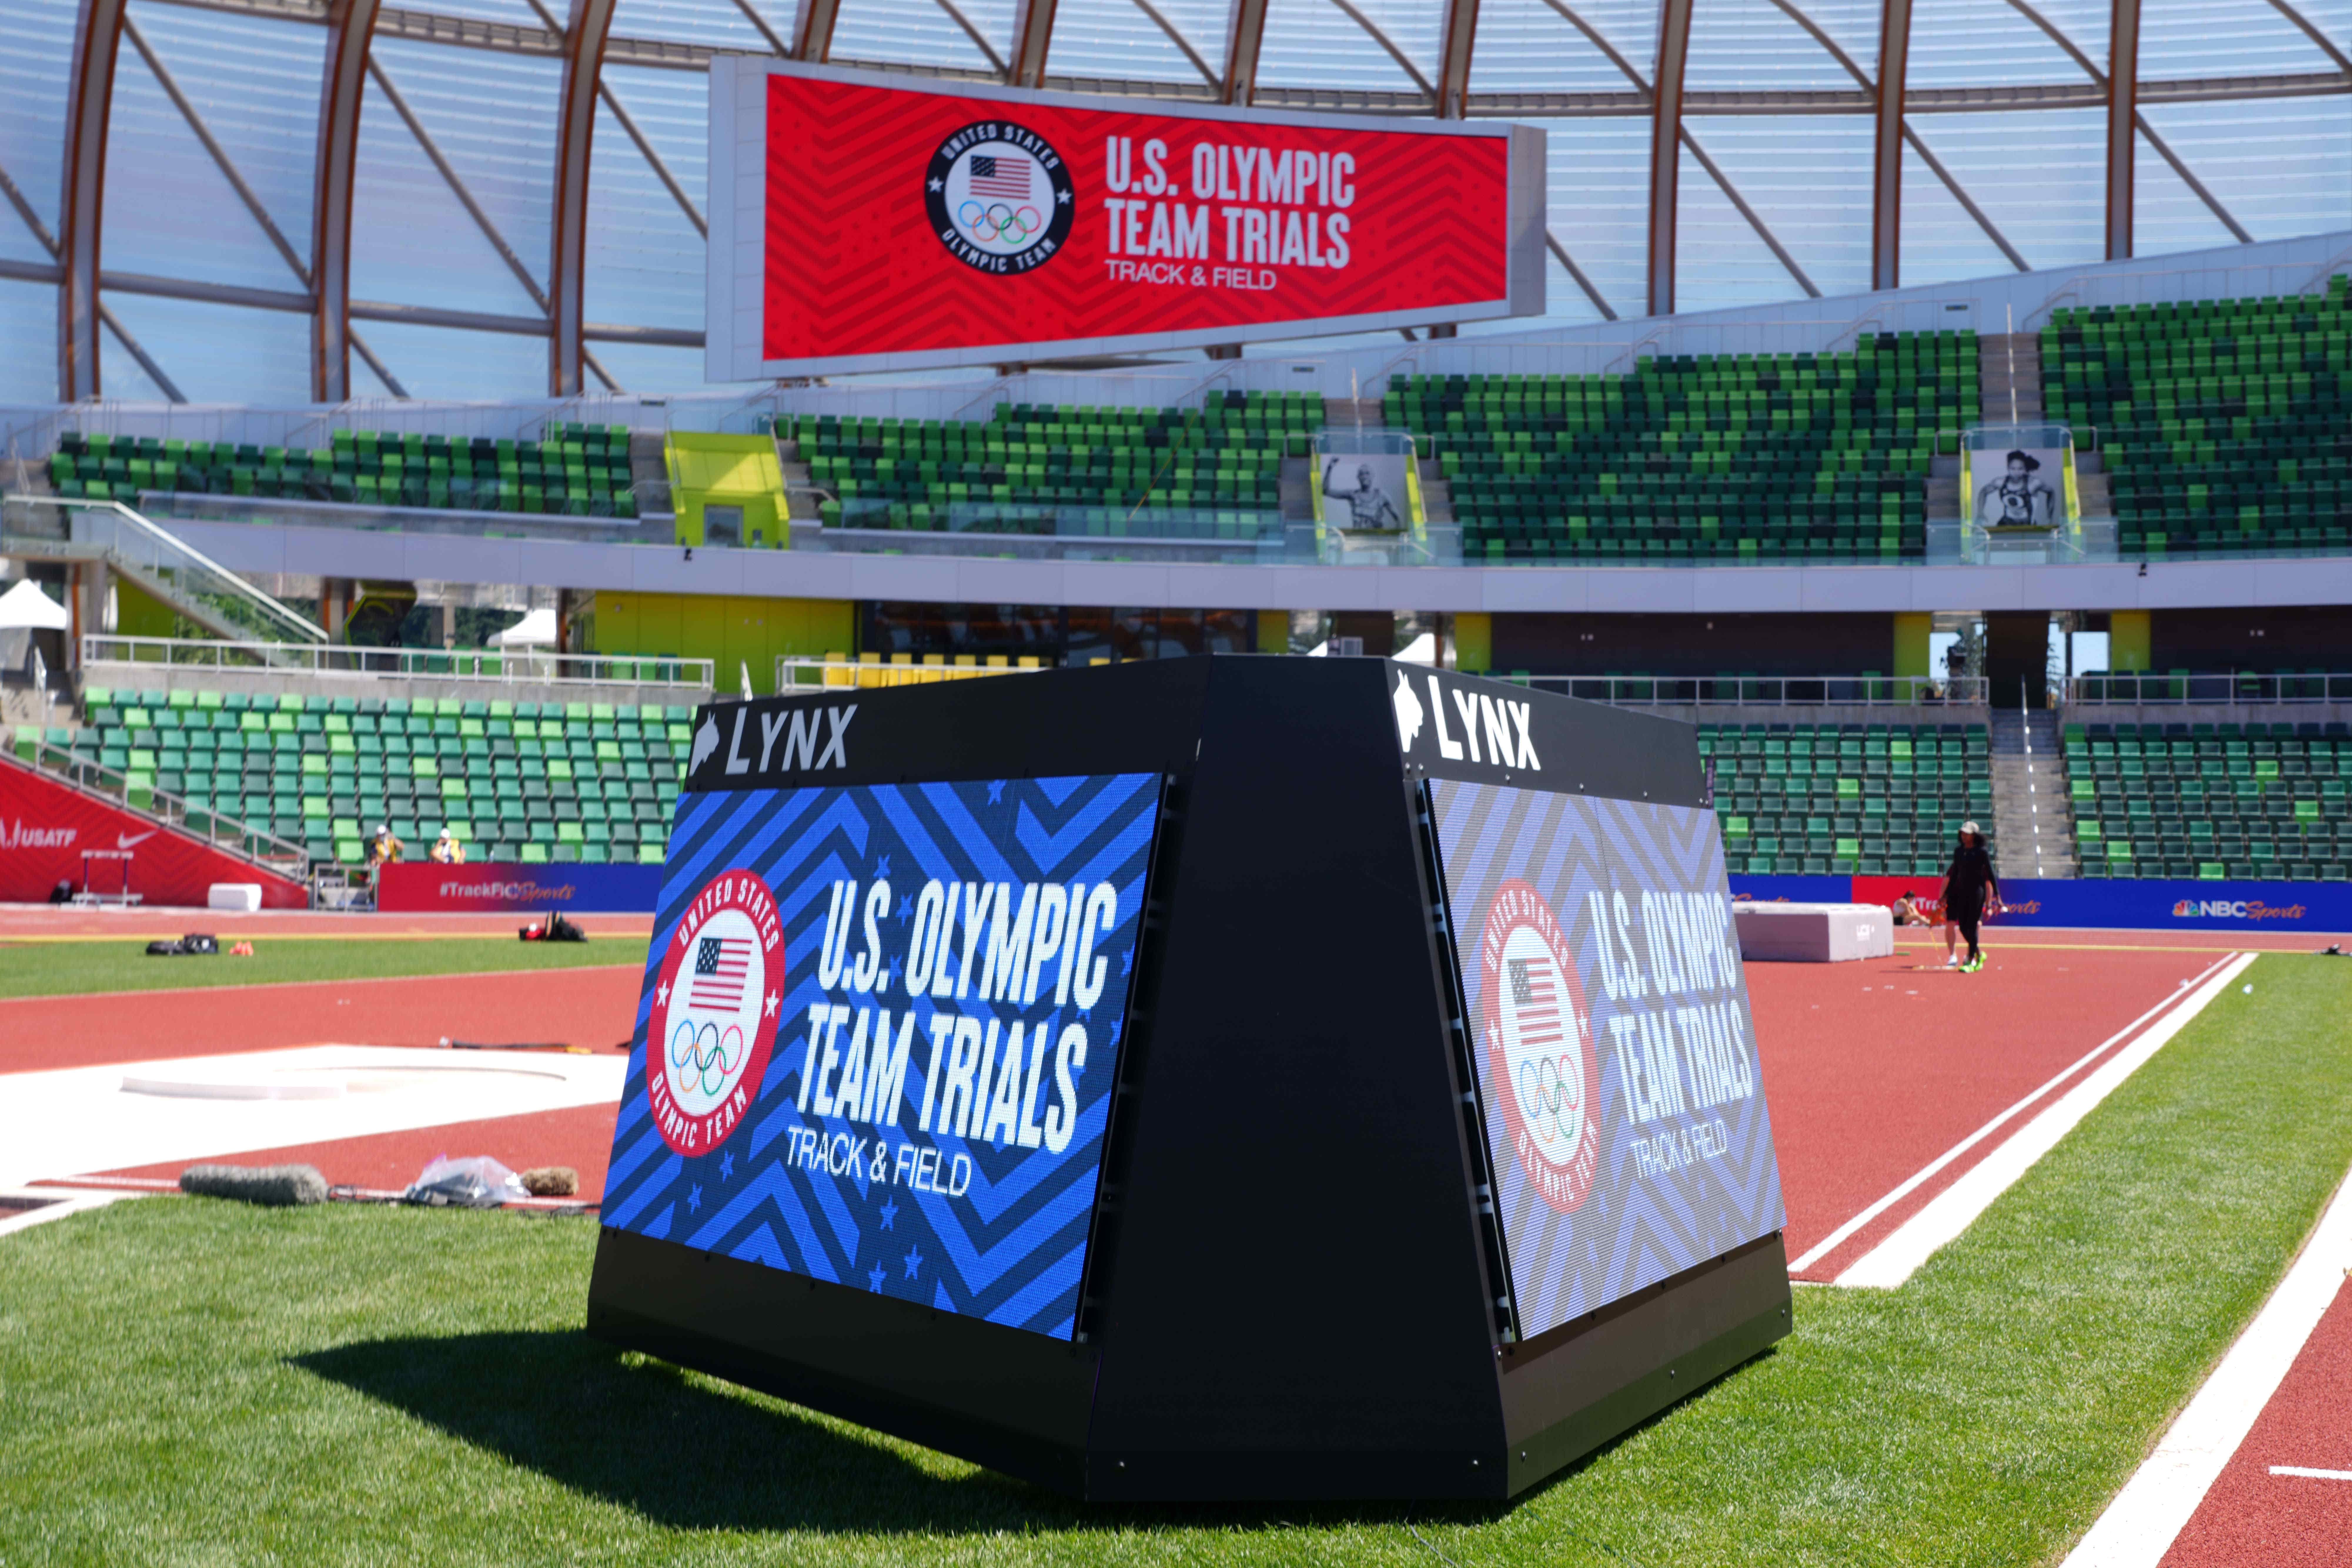 Track & Field: US Olymic Team Trials-City Scenes